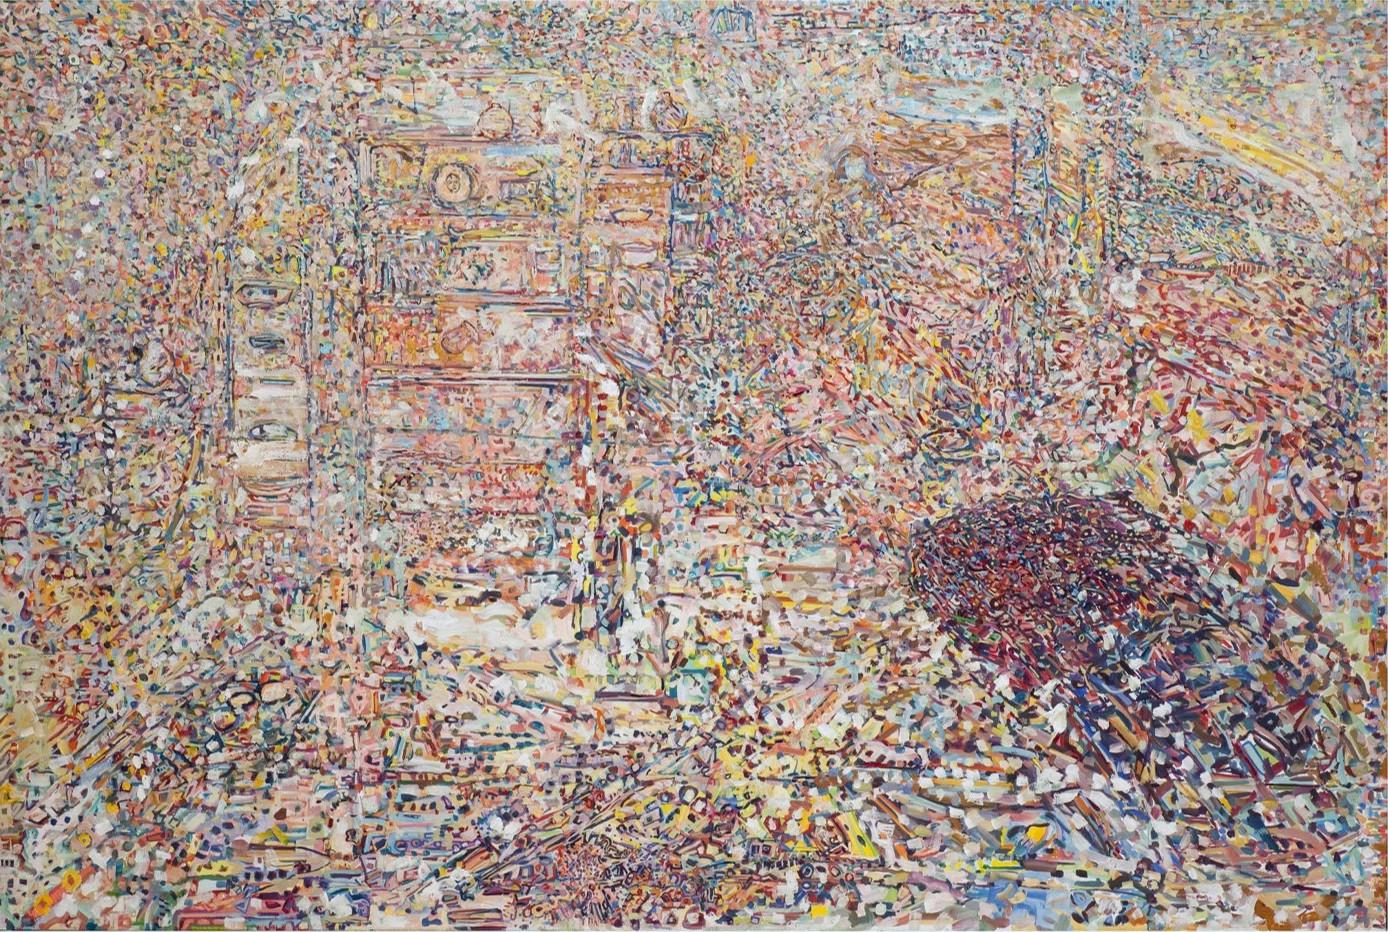 Zohar Cohen. Adva. Jackson's Painting Prize.